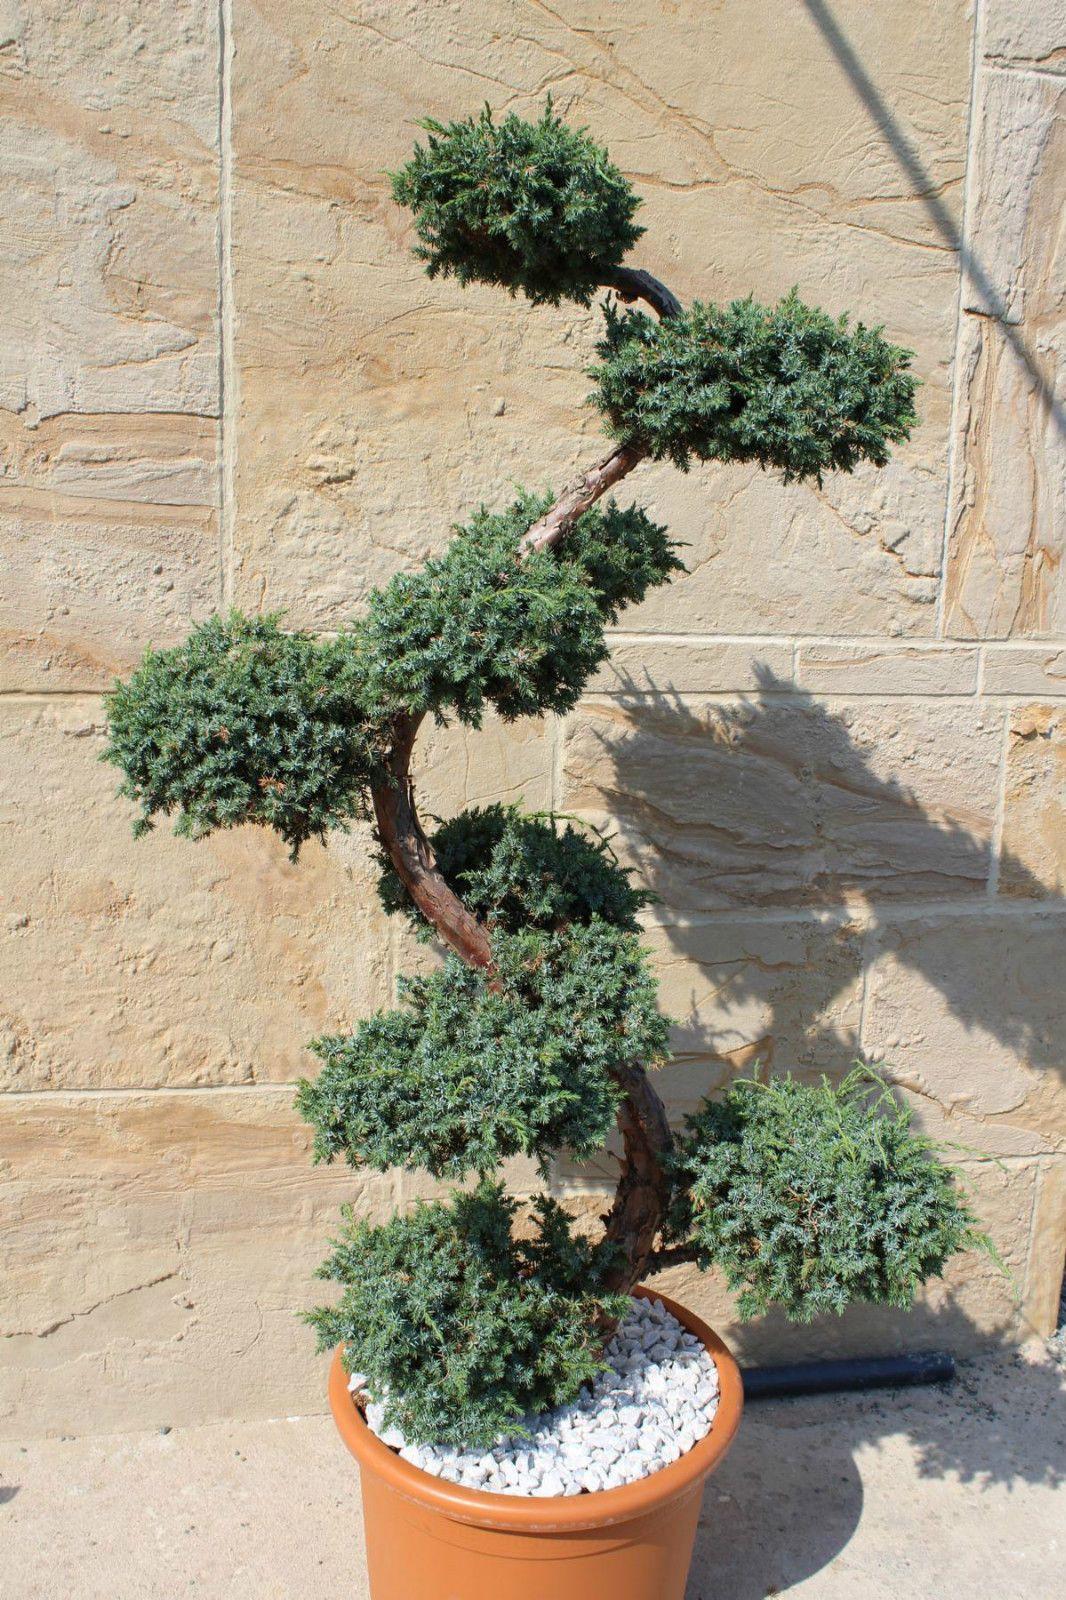 Juniperus Squa Blue Carpet Wacholder Bonsai S Topiaries Bonsai 160cm Ebay Japanese Garden Trees To Plant Plants